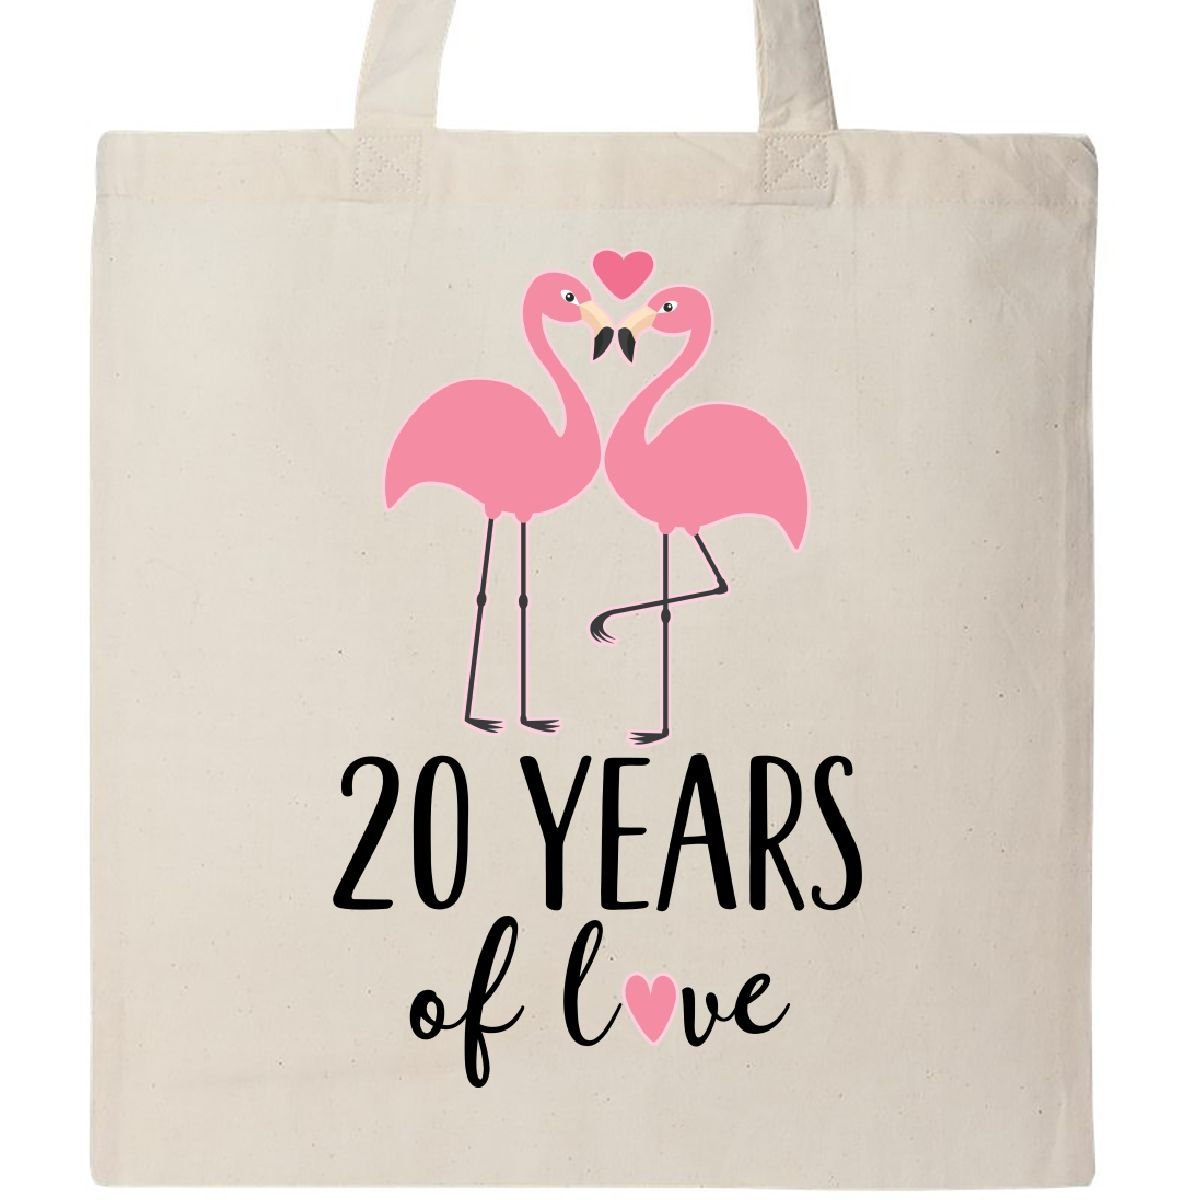 Inktastic - 20th Wedding Anniversary Gift Flamingo Tote Bag Natural